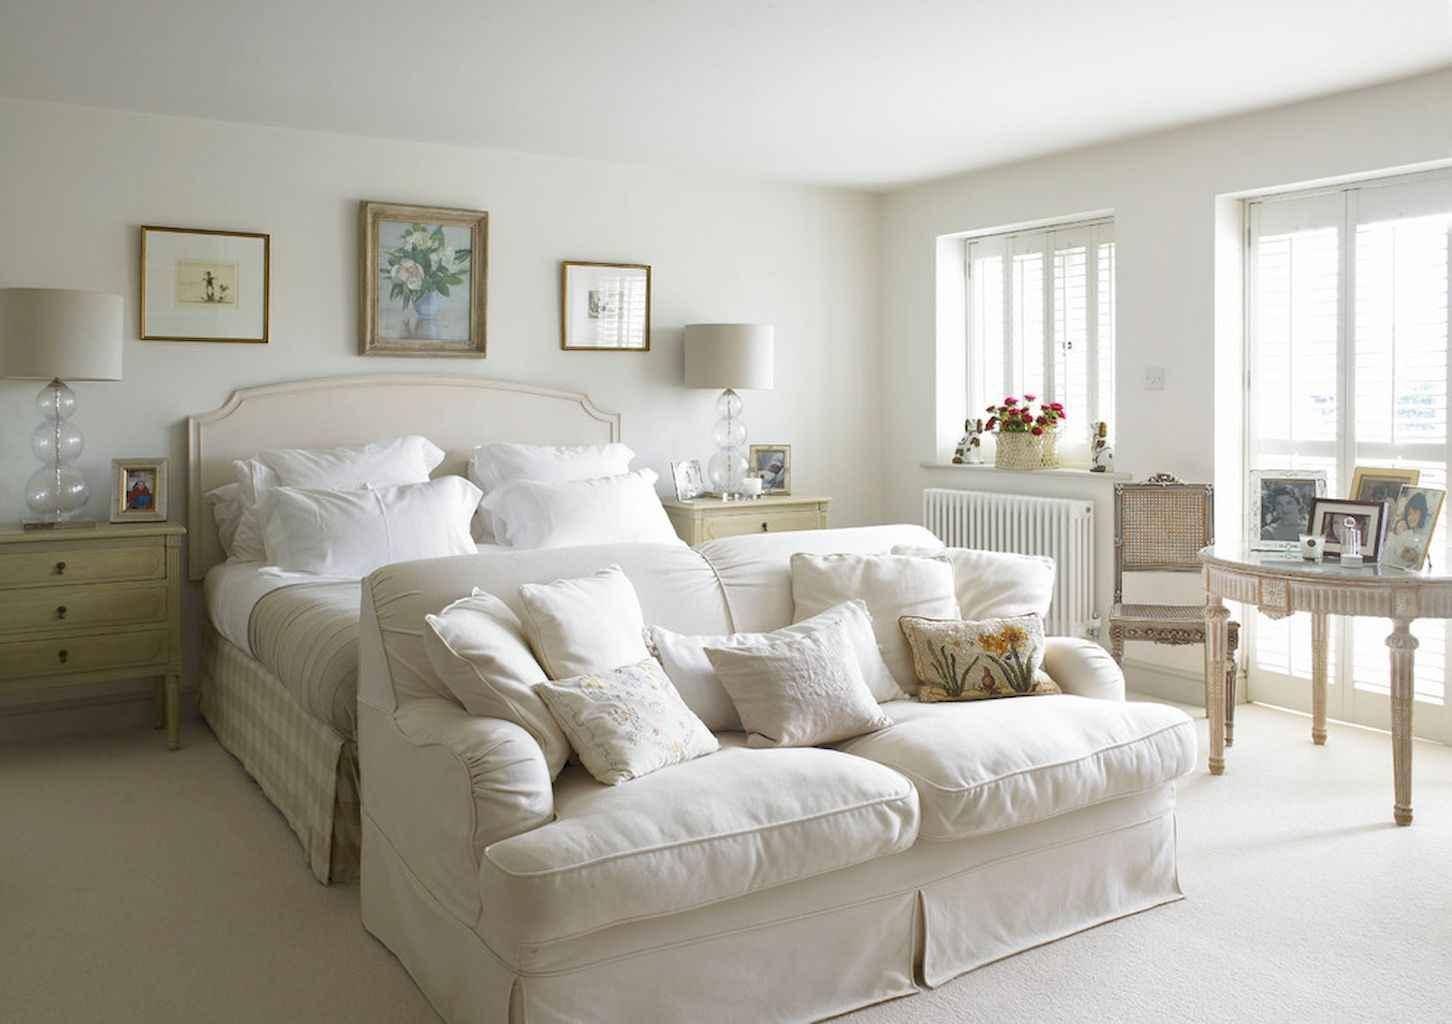 100 Stunning Farmhouse Master Bedroom Decor Ideas (68)